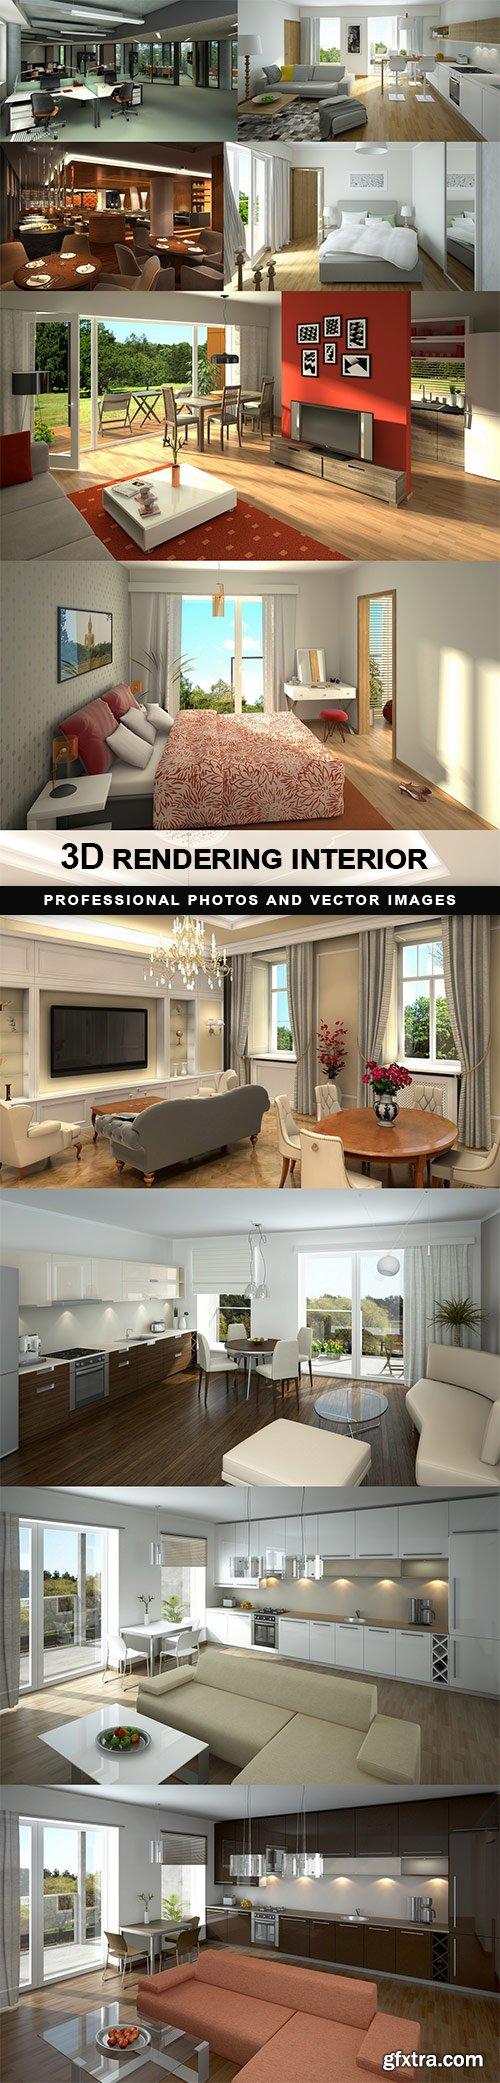 3D rendering interior